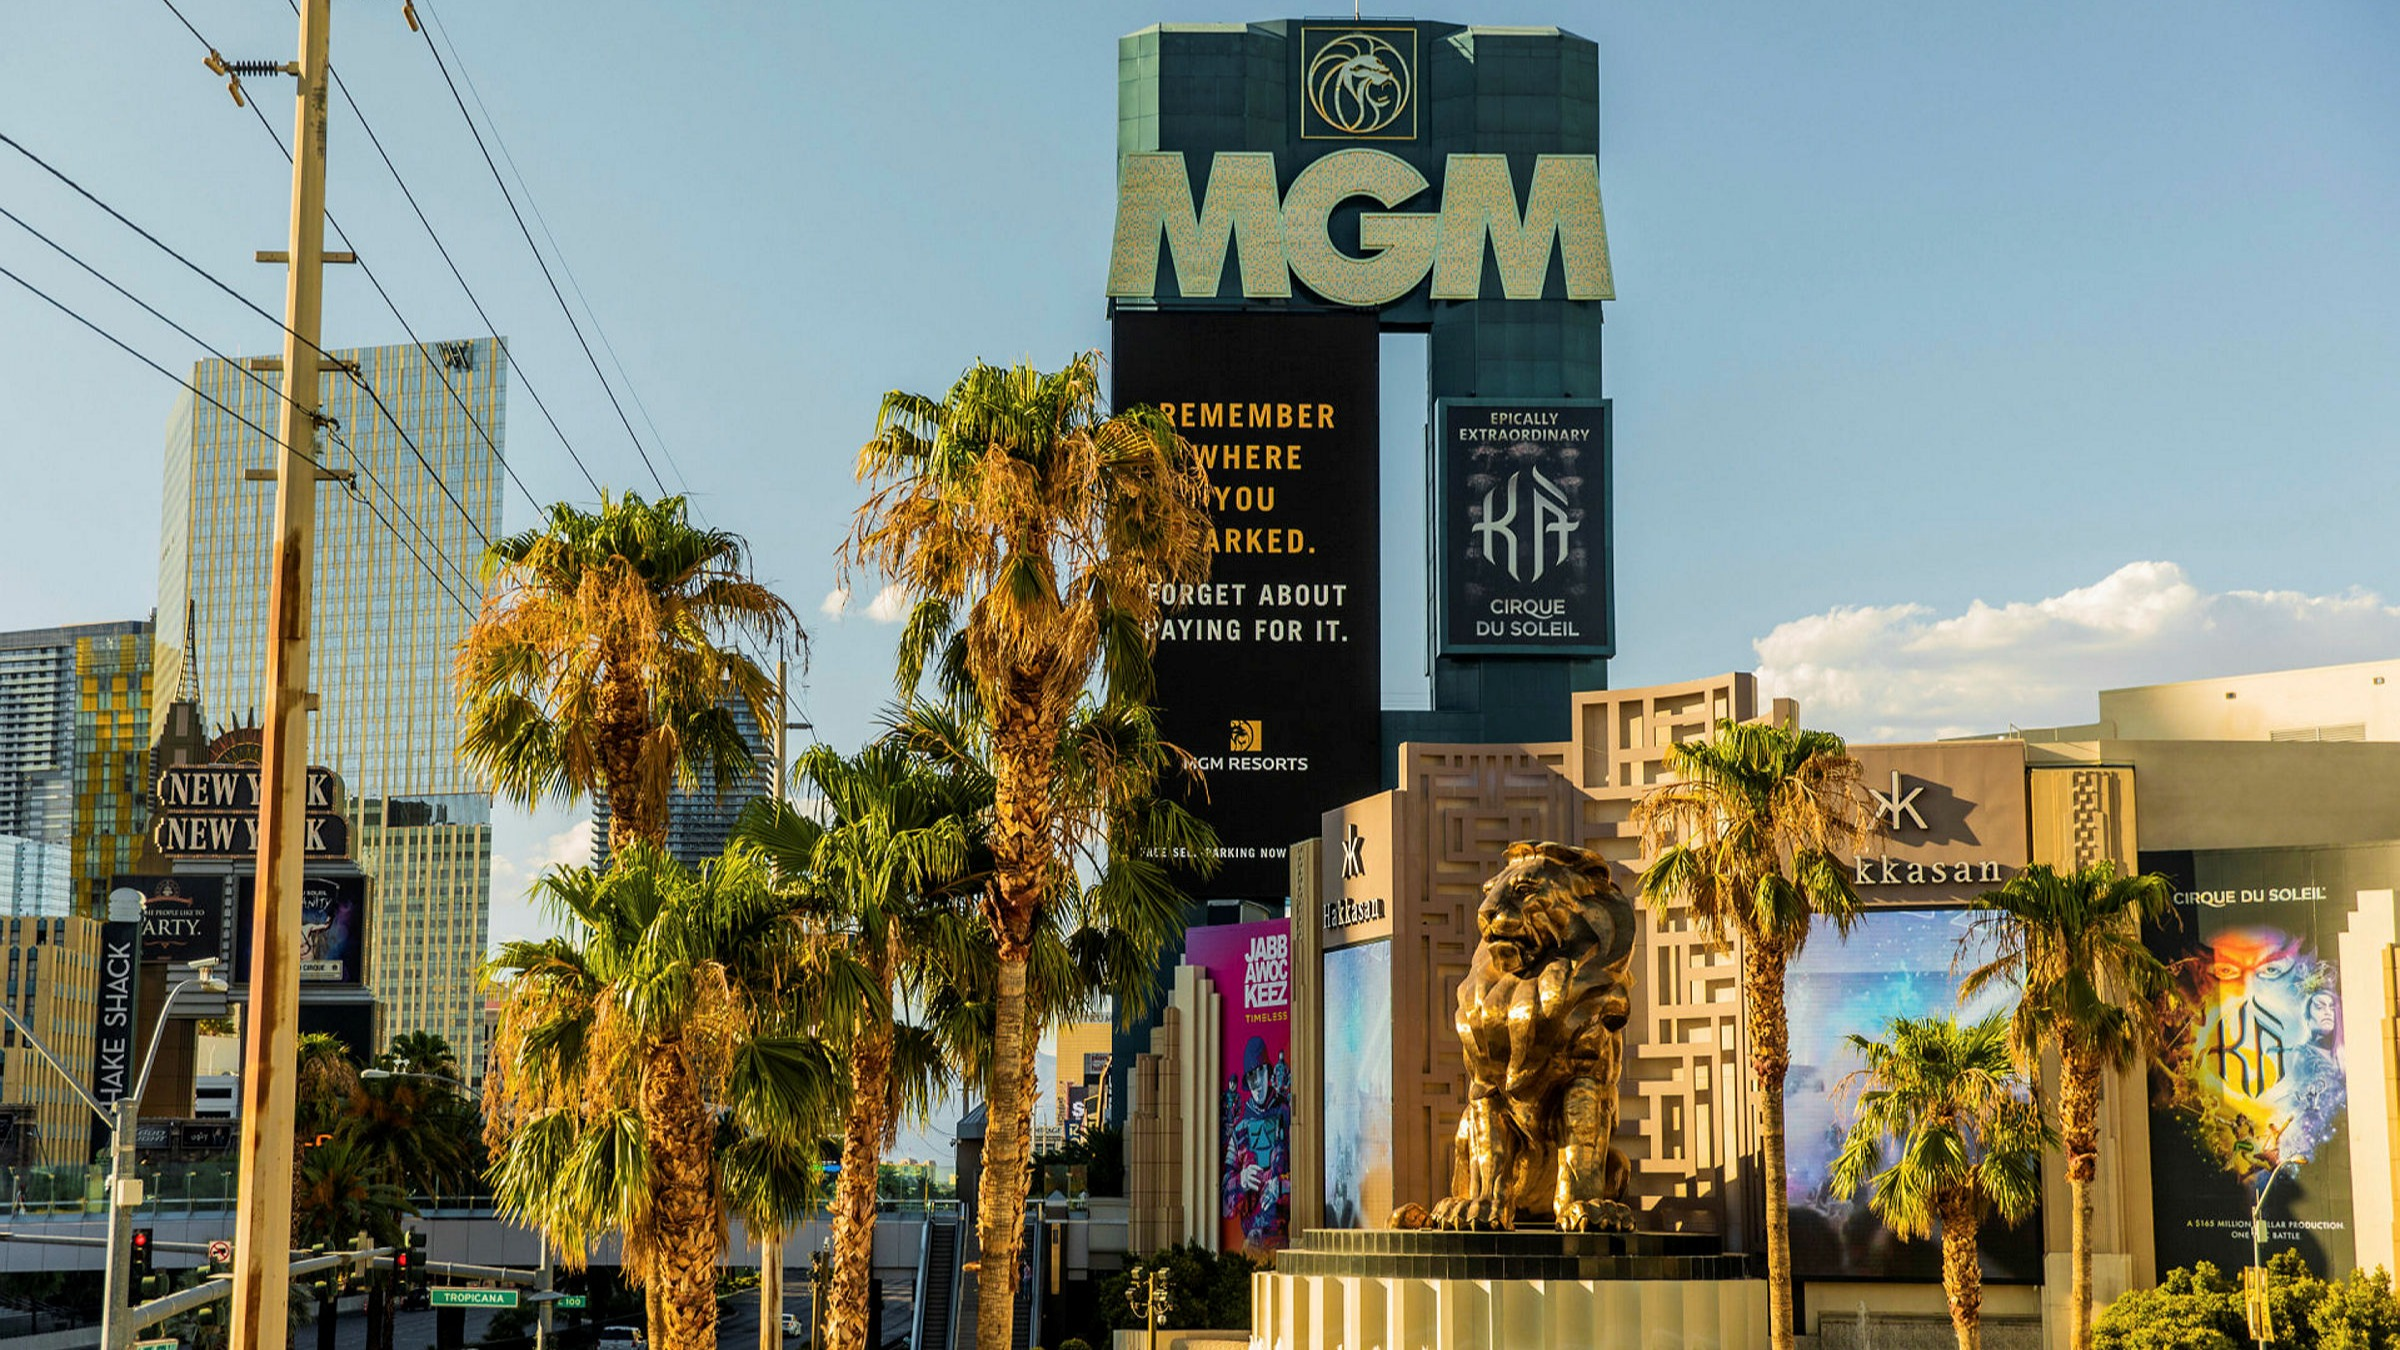 Mgm Grand Las Vegas Sports Betting